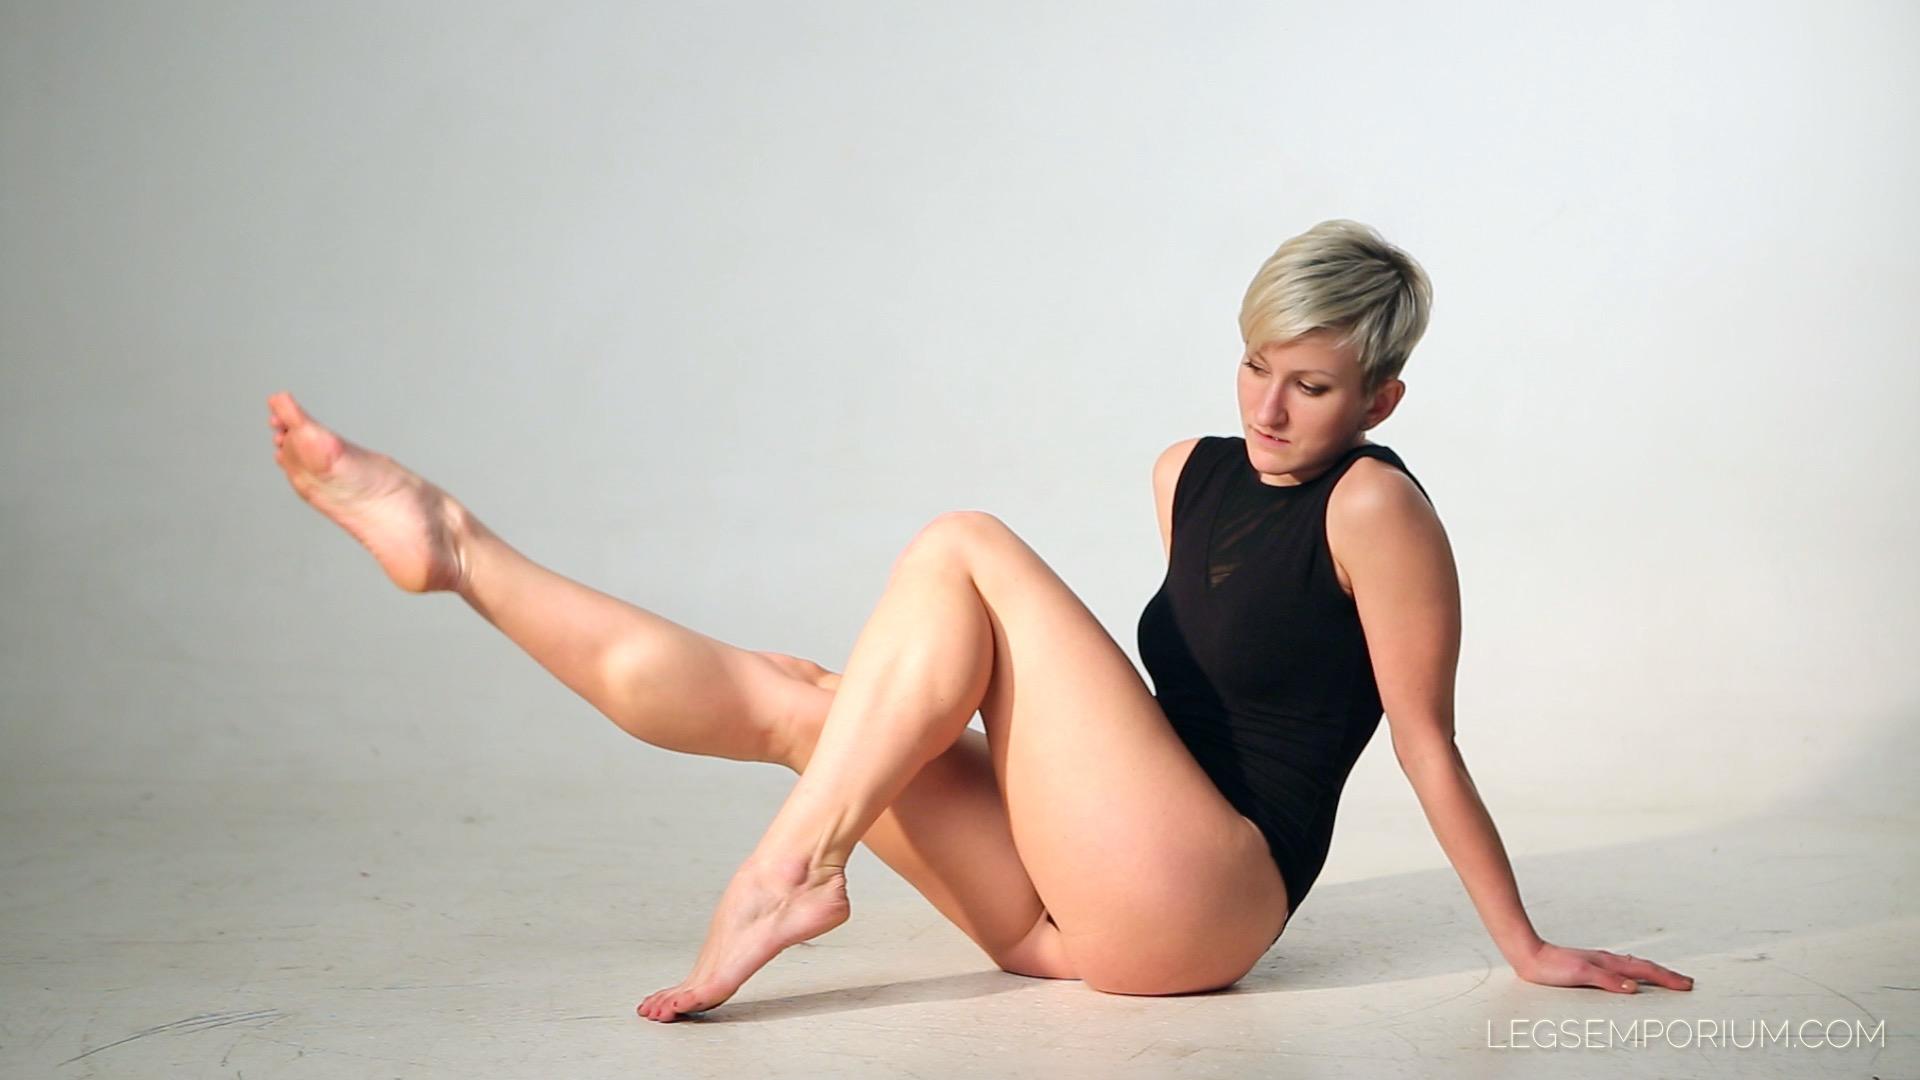 Karina - Fitness Legs Of Sexiness 3  Legs Emporium-2508